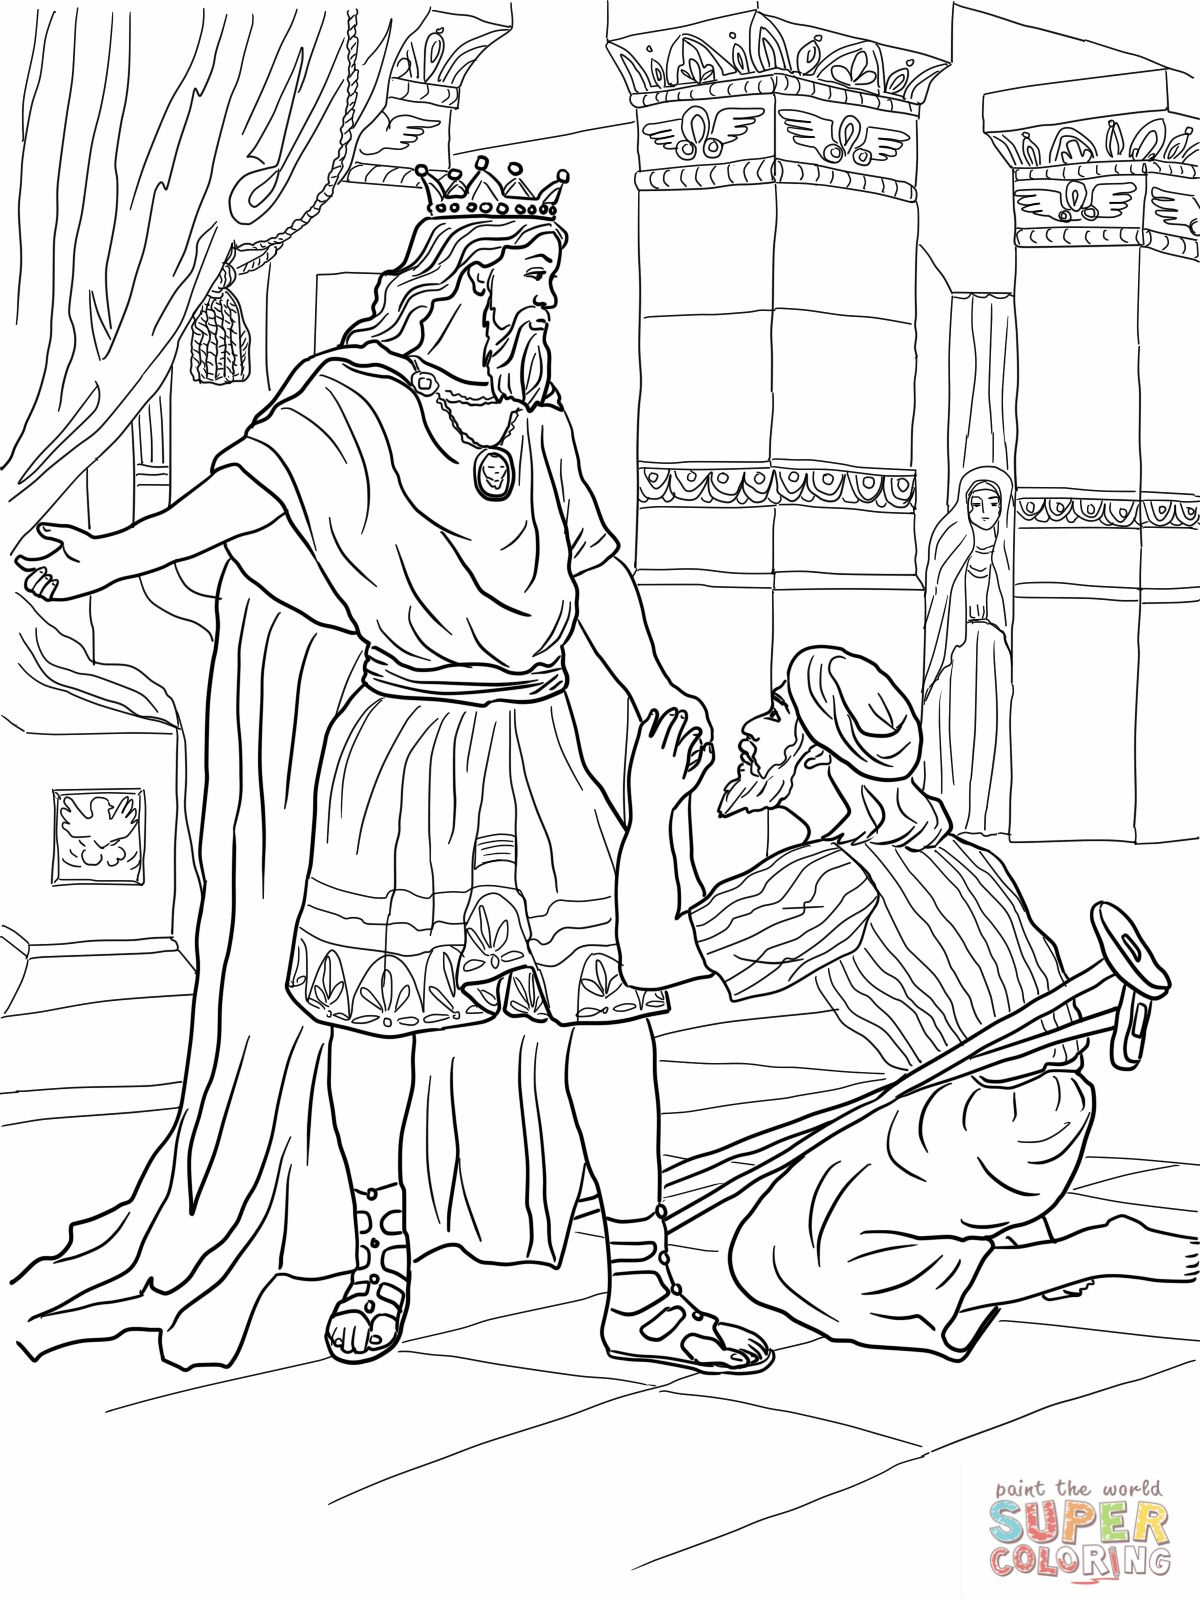 1200x1600 Mephibosheth Coloring Pages David Helps Mephibosheth Coloring